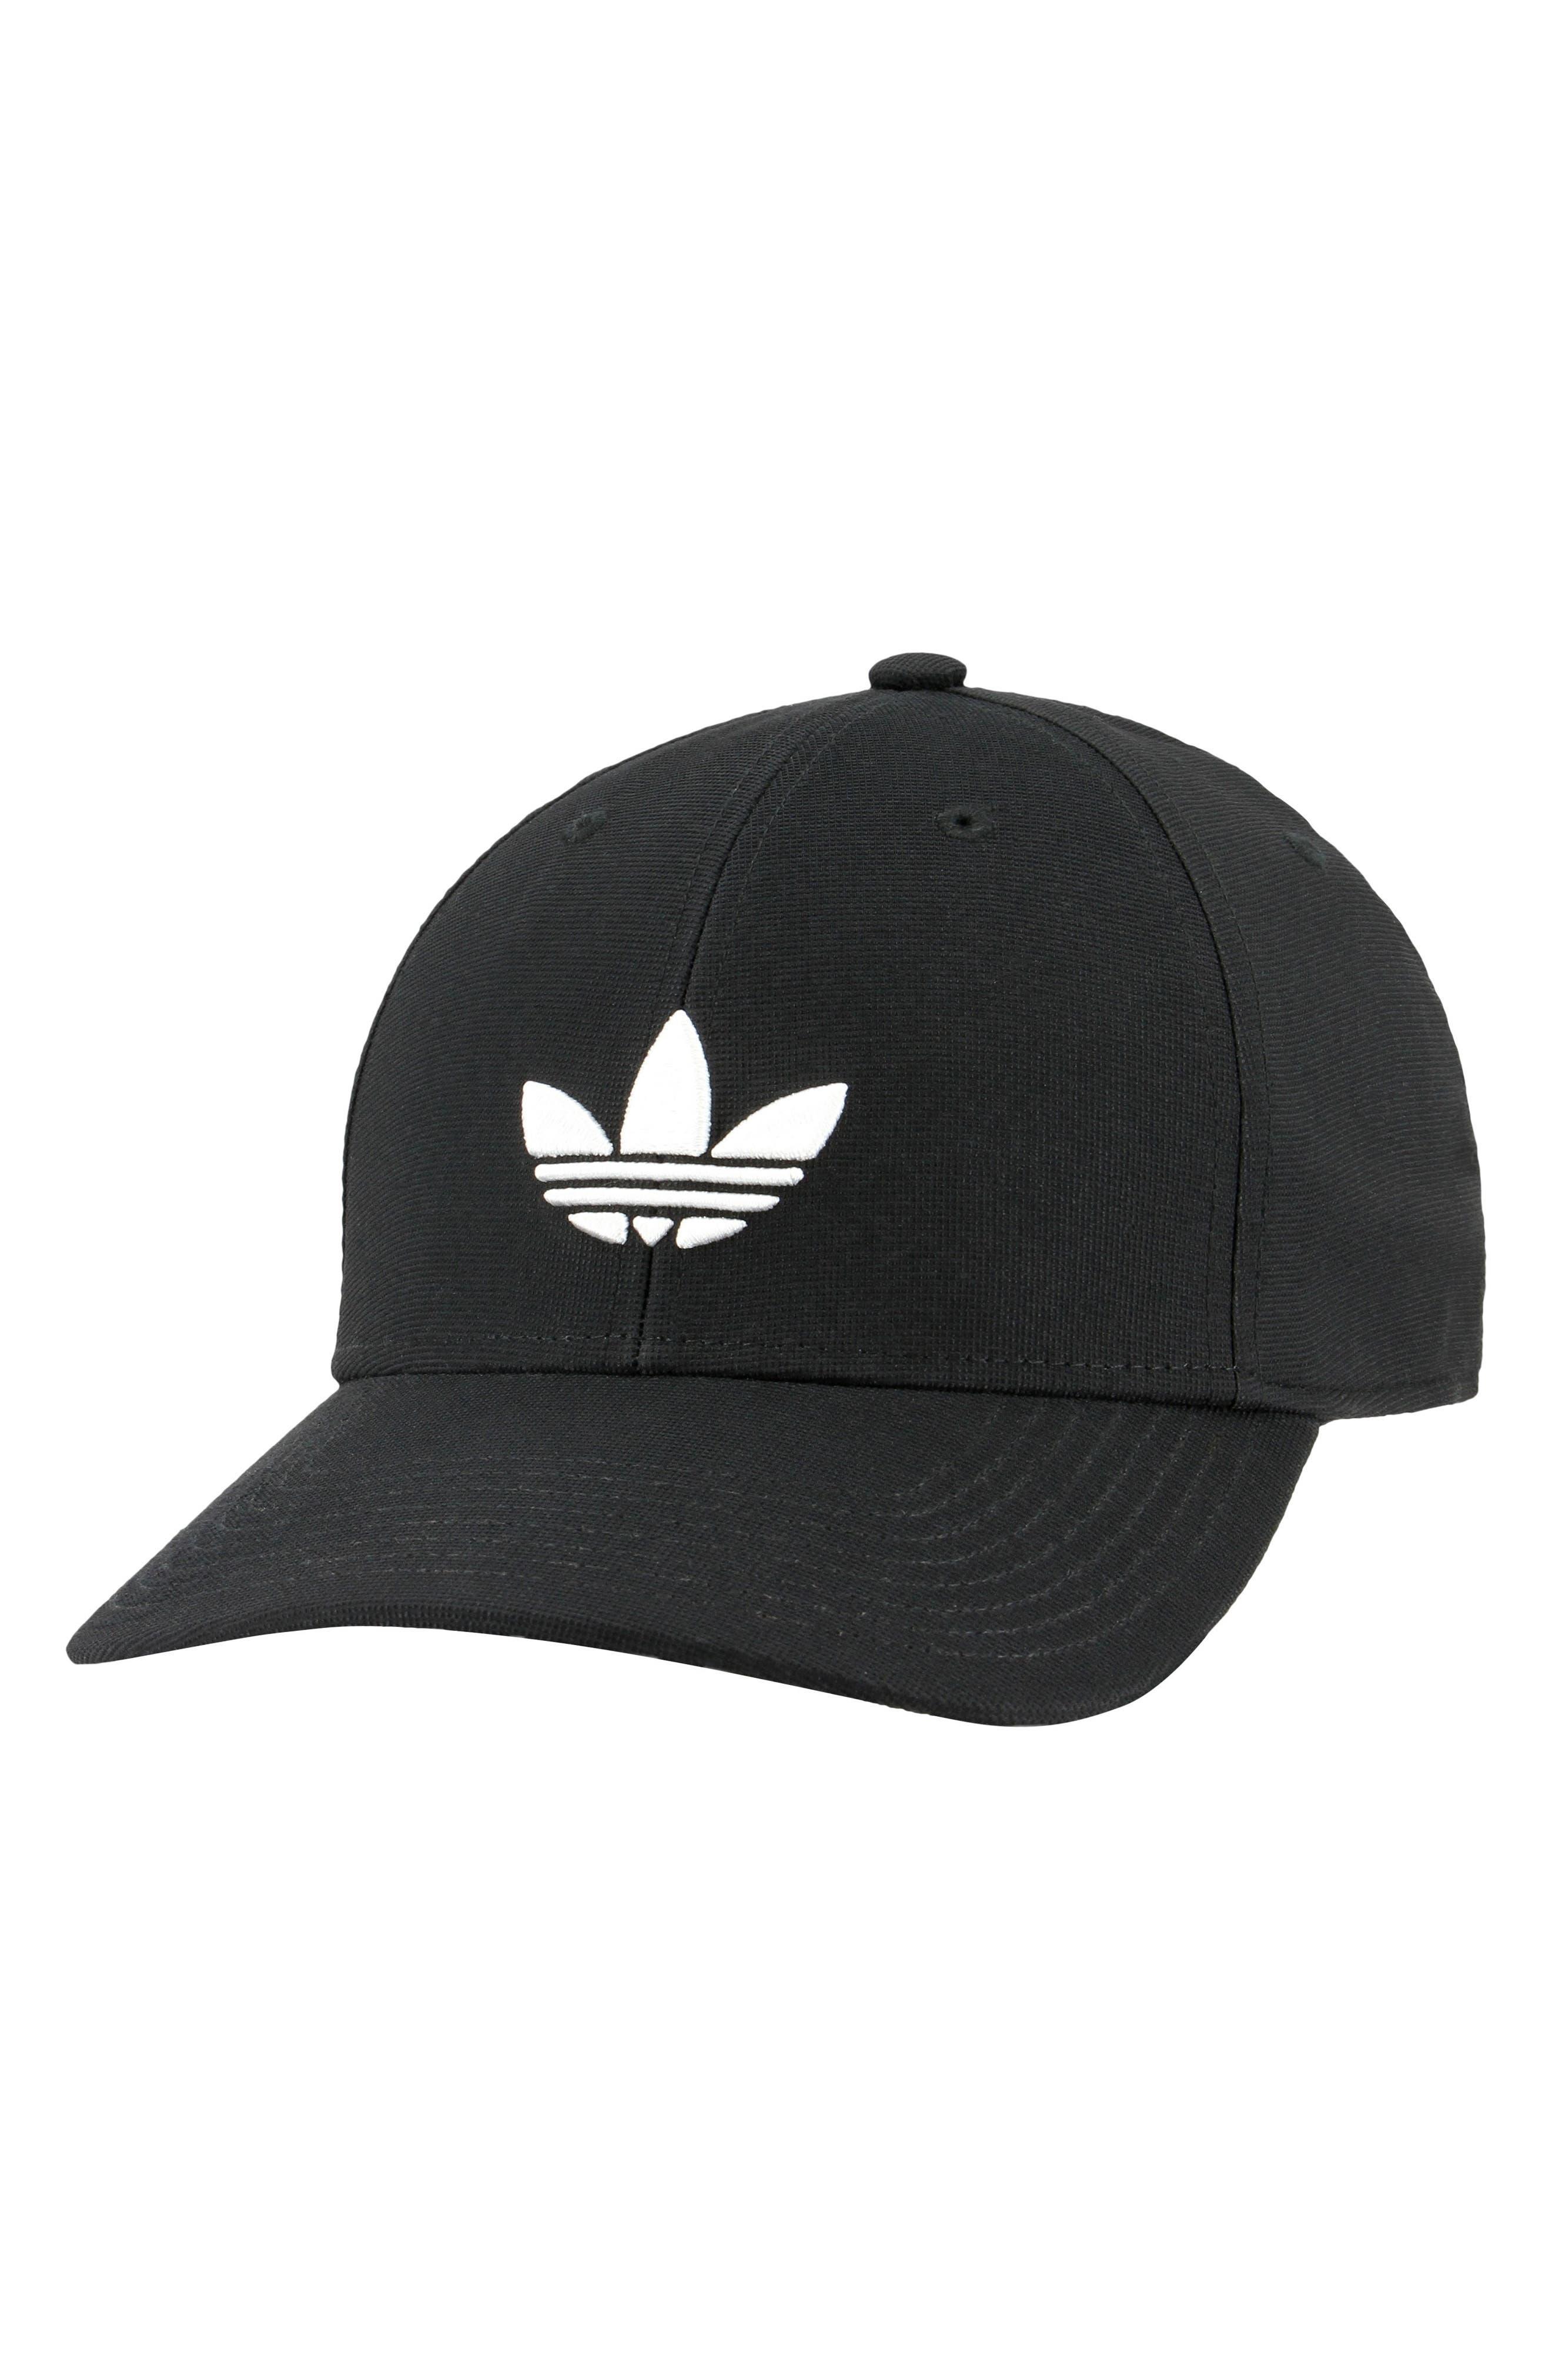 Trefoil Stretch Ball Cap,                         Main,                         color, Black/ White